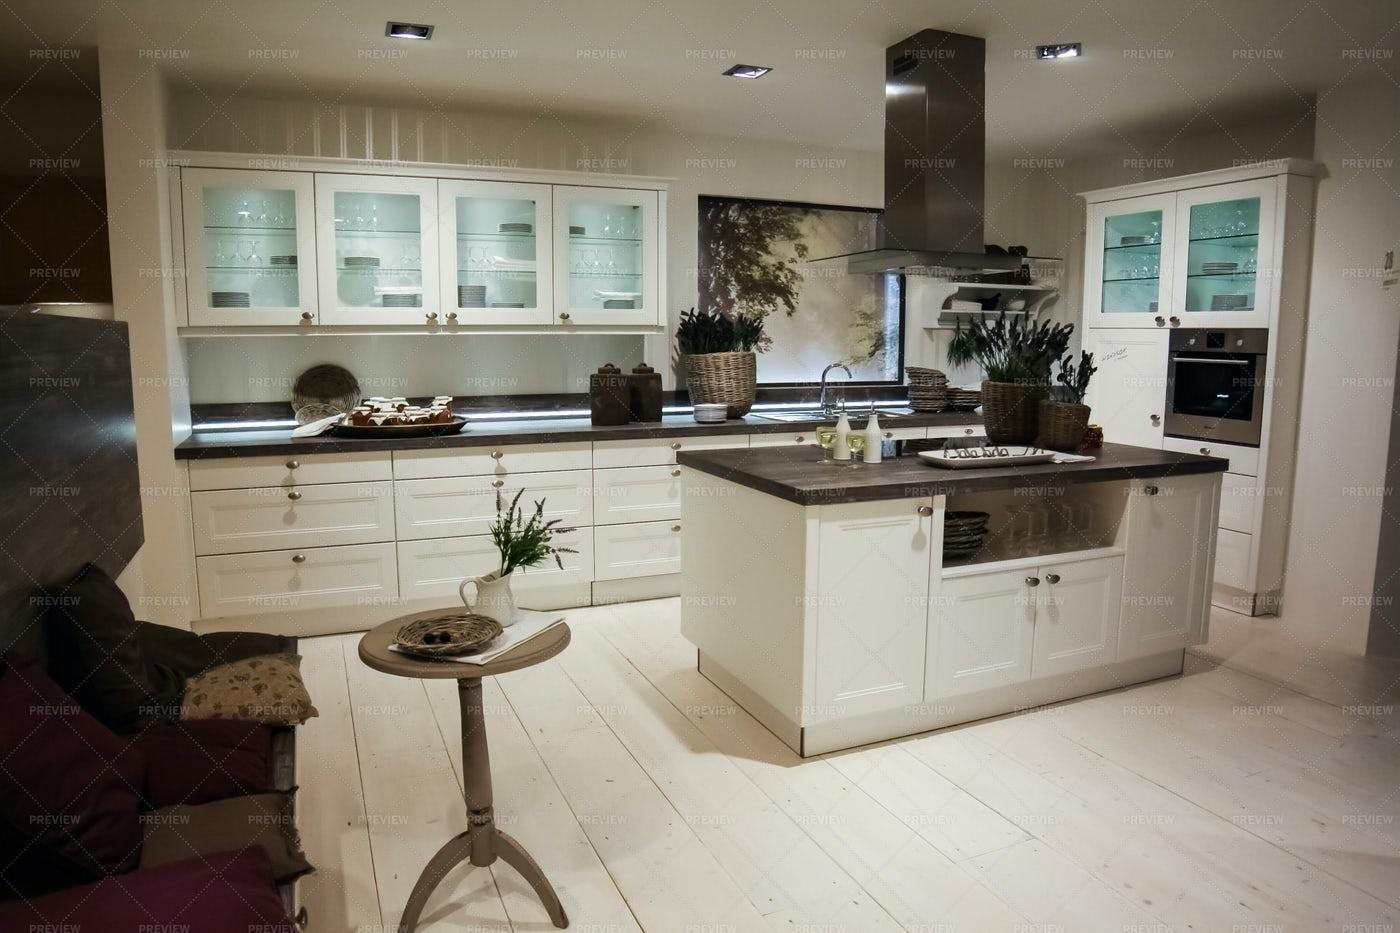 A Modern Kitchen Design: Stock Photos